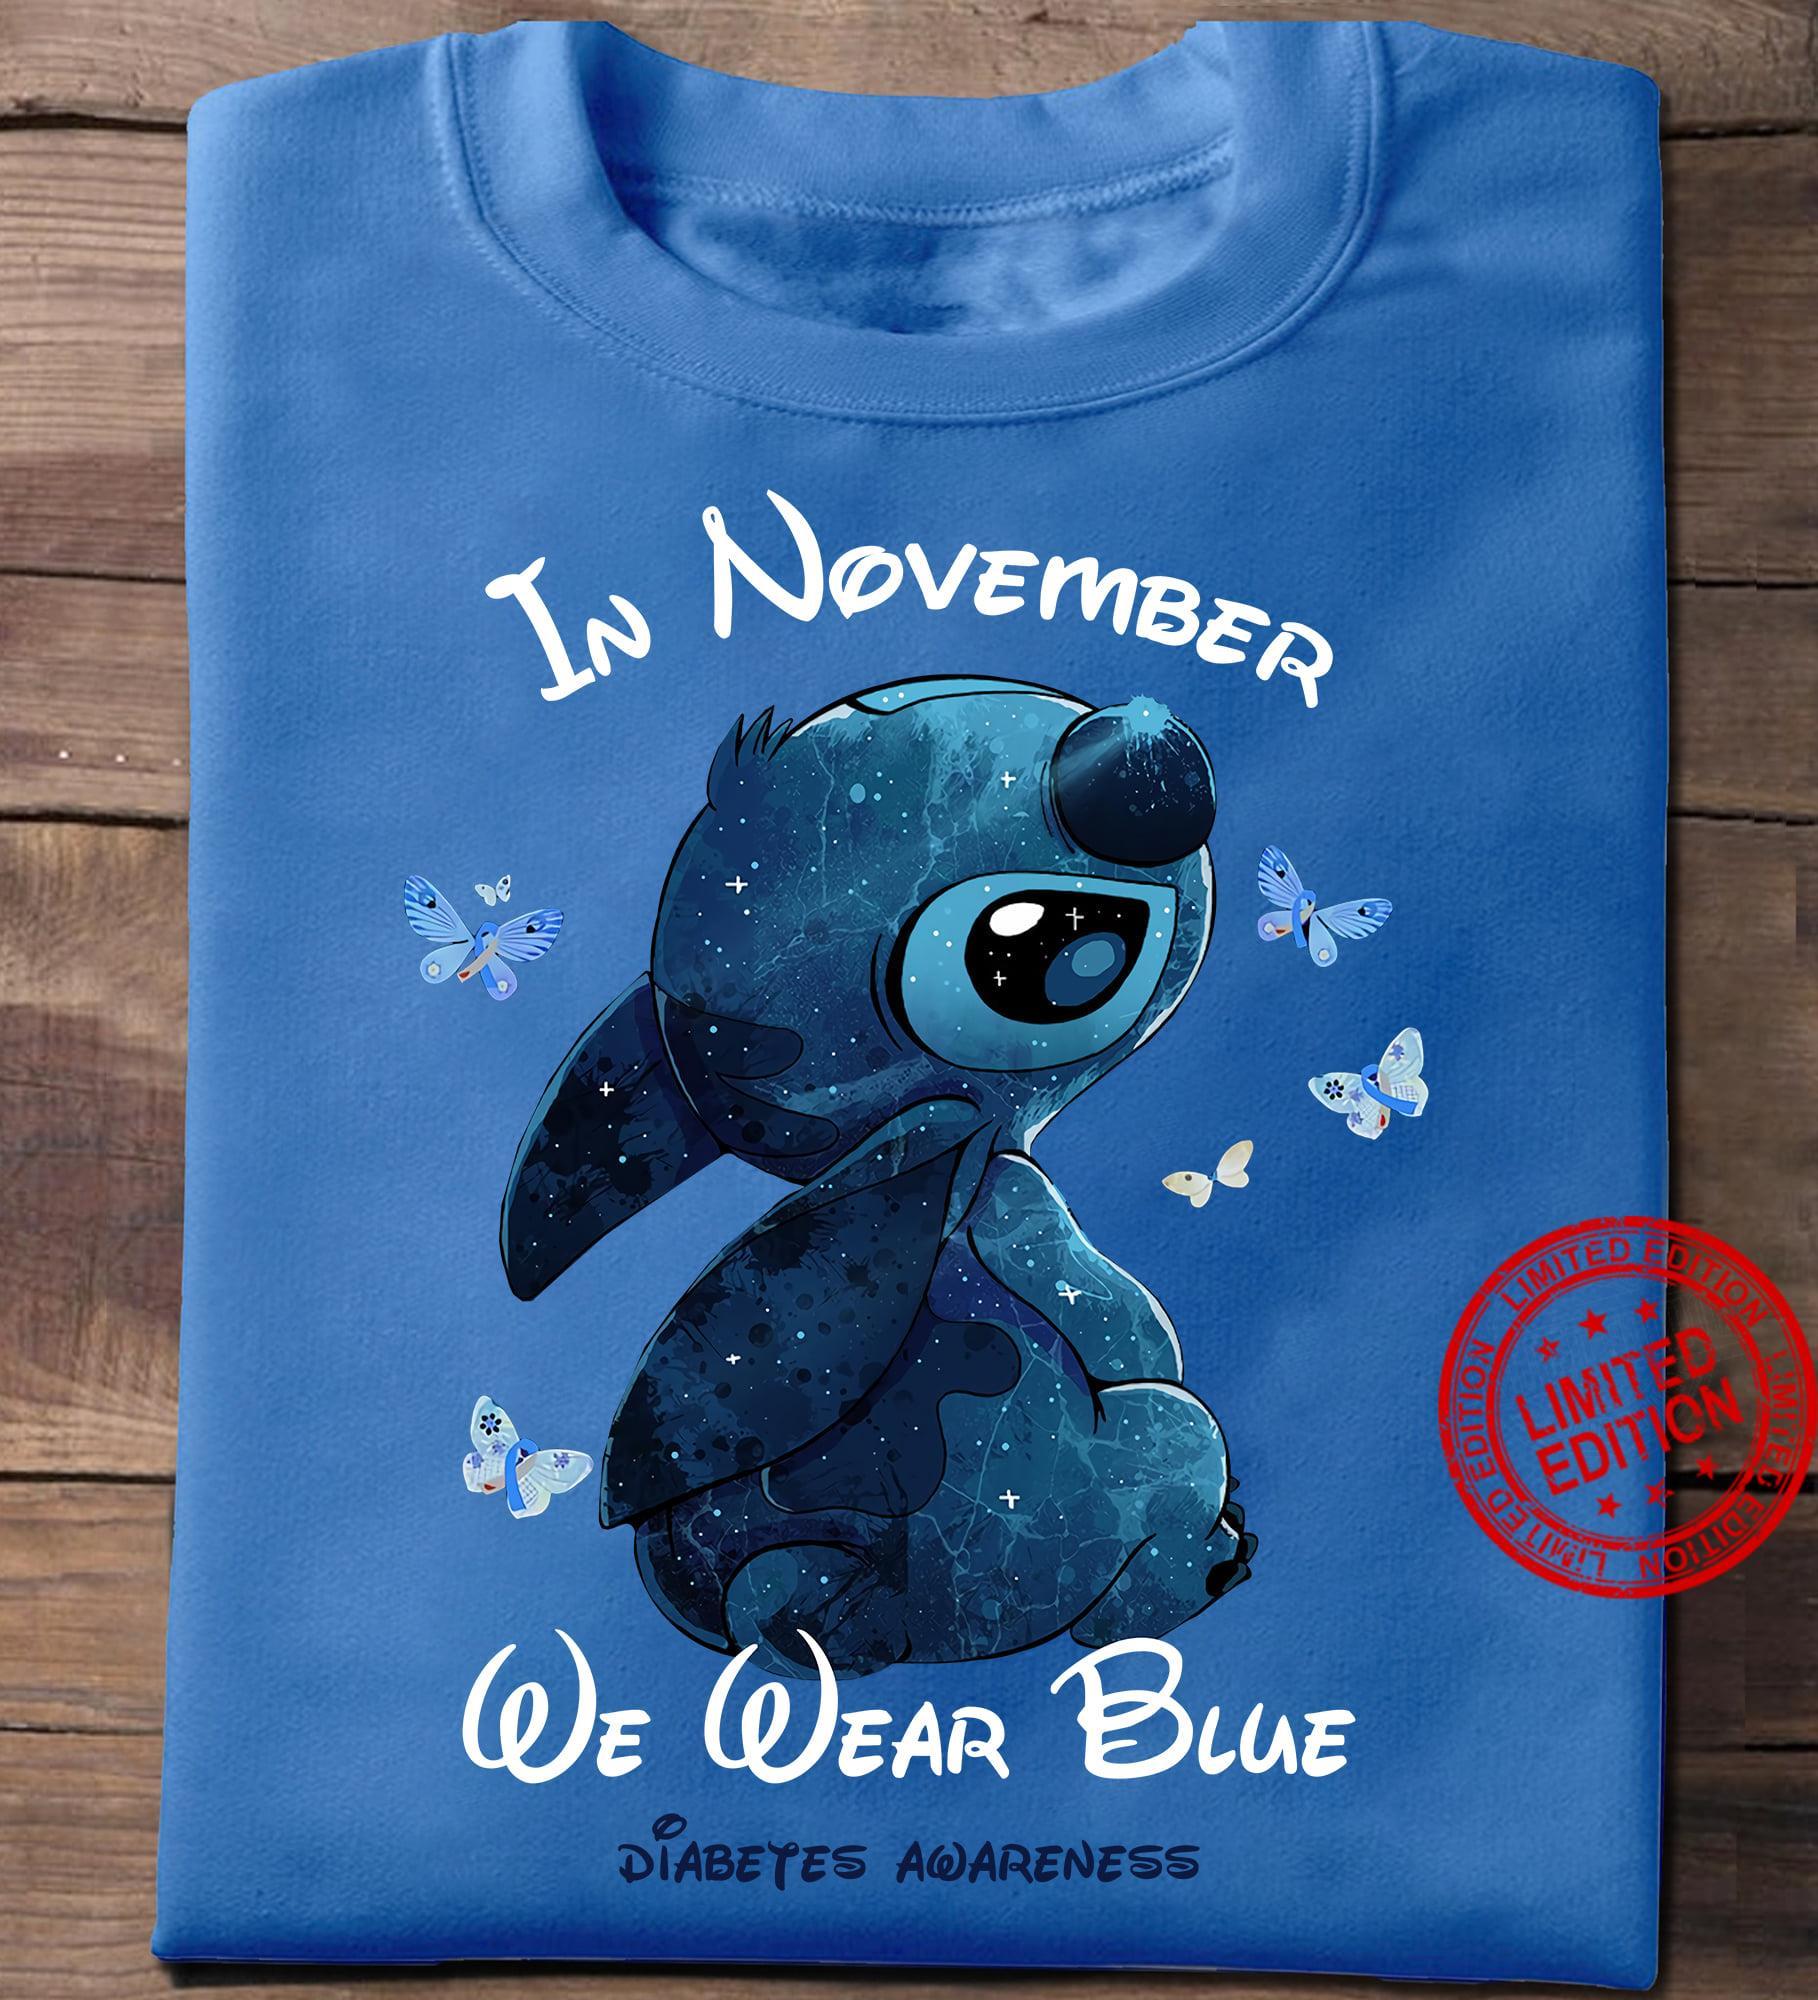 Stitch In November We Wear Blue Diabetes Awareness Shirt